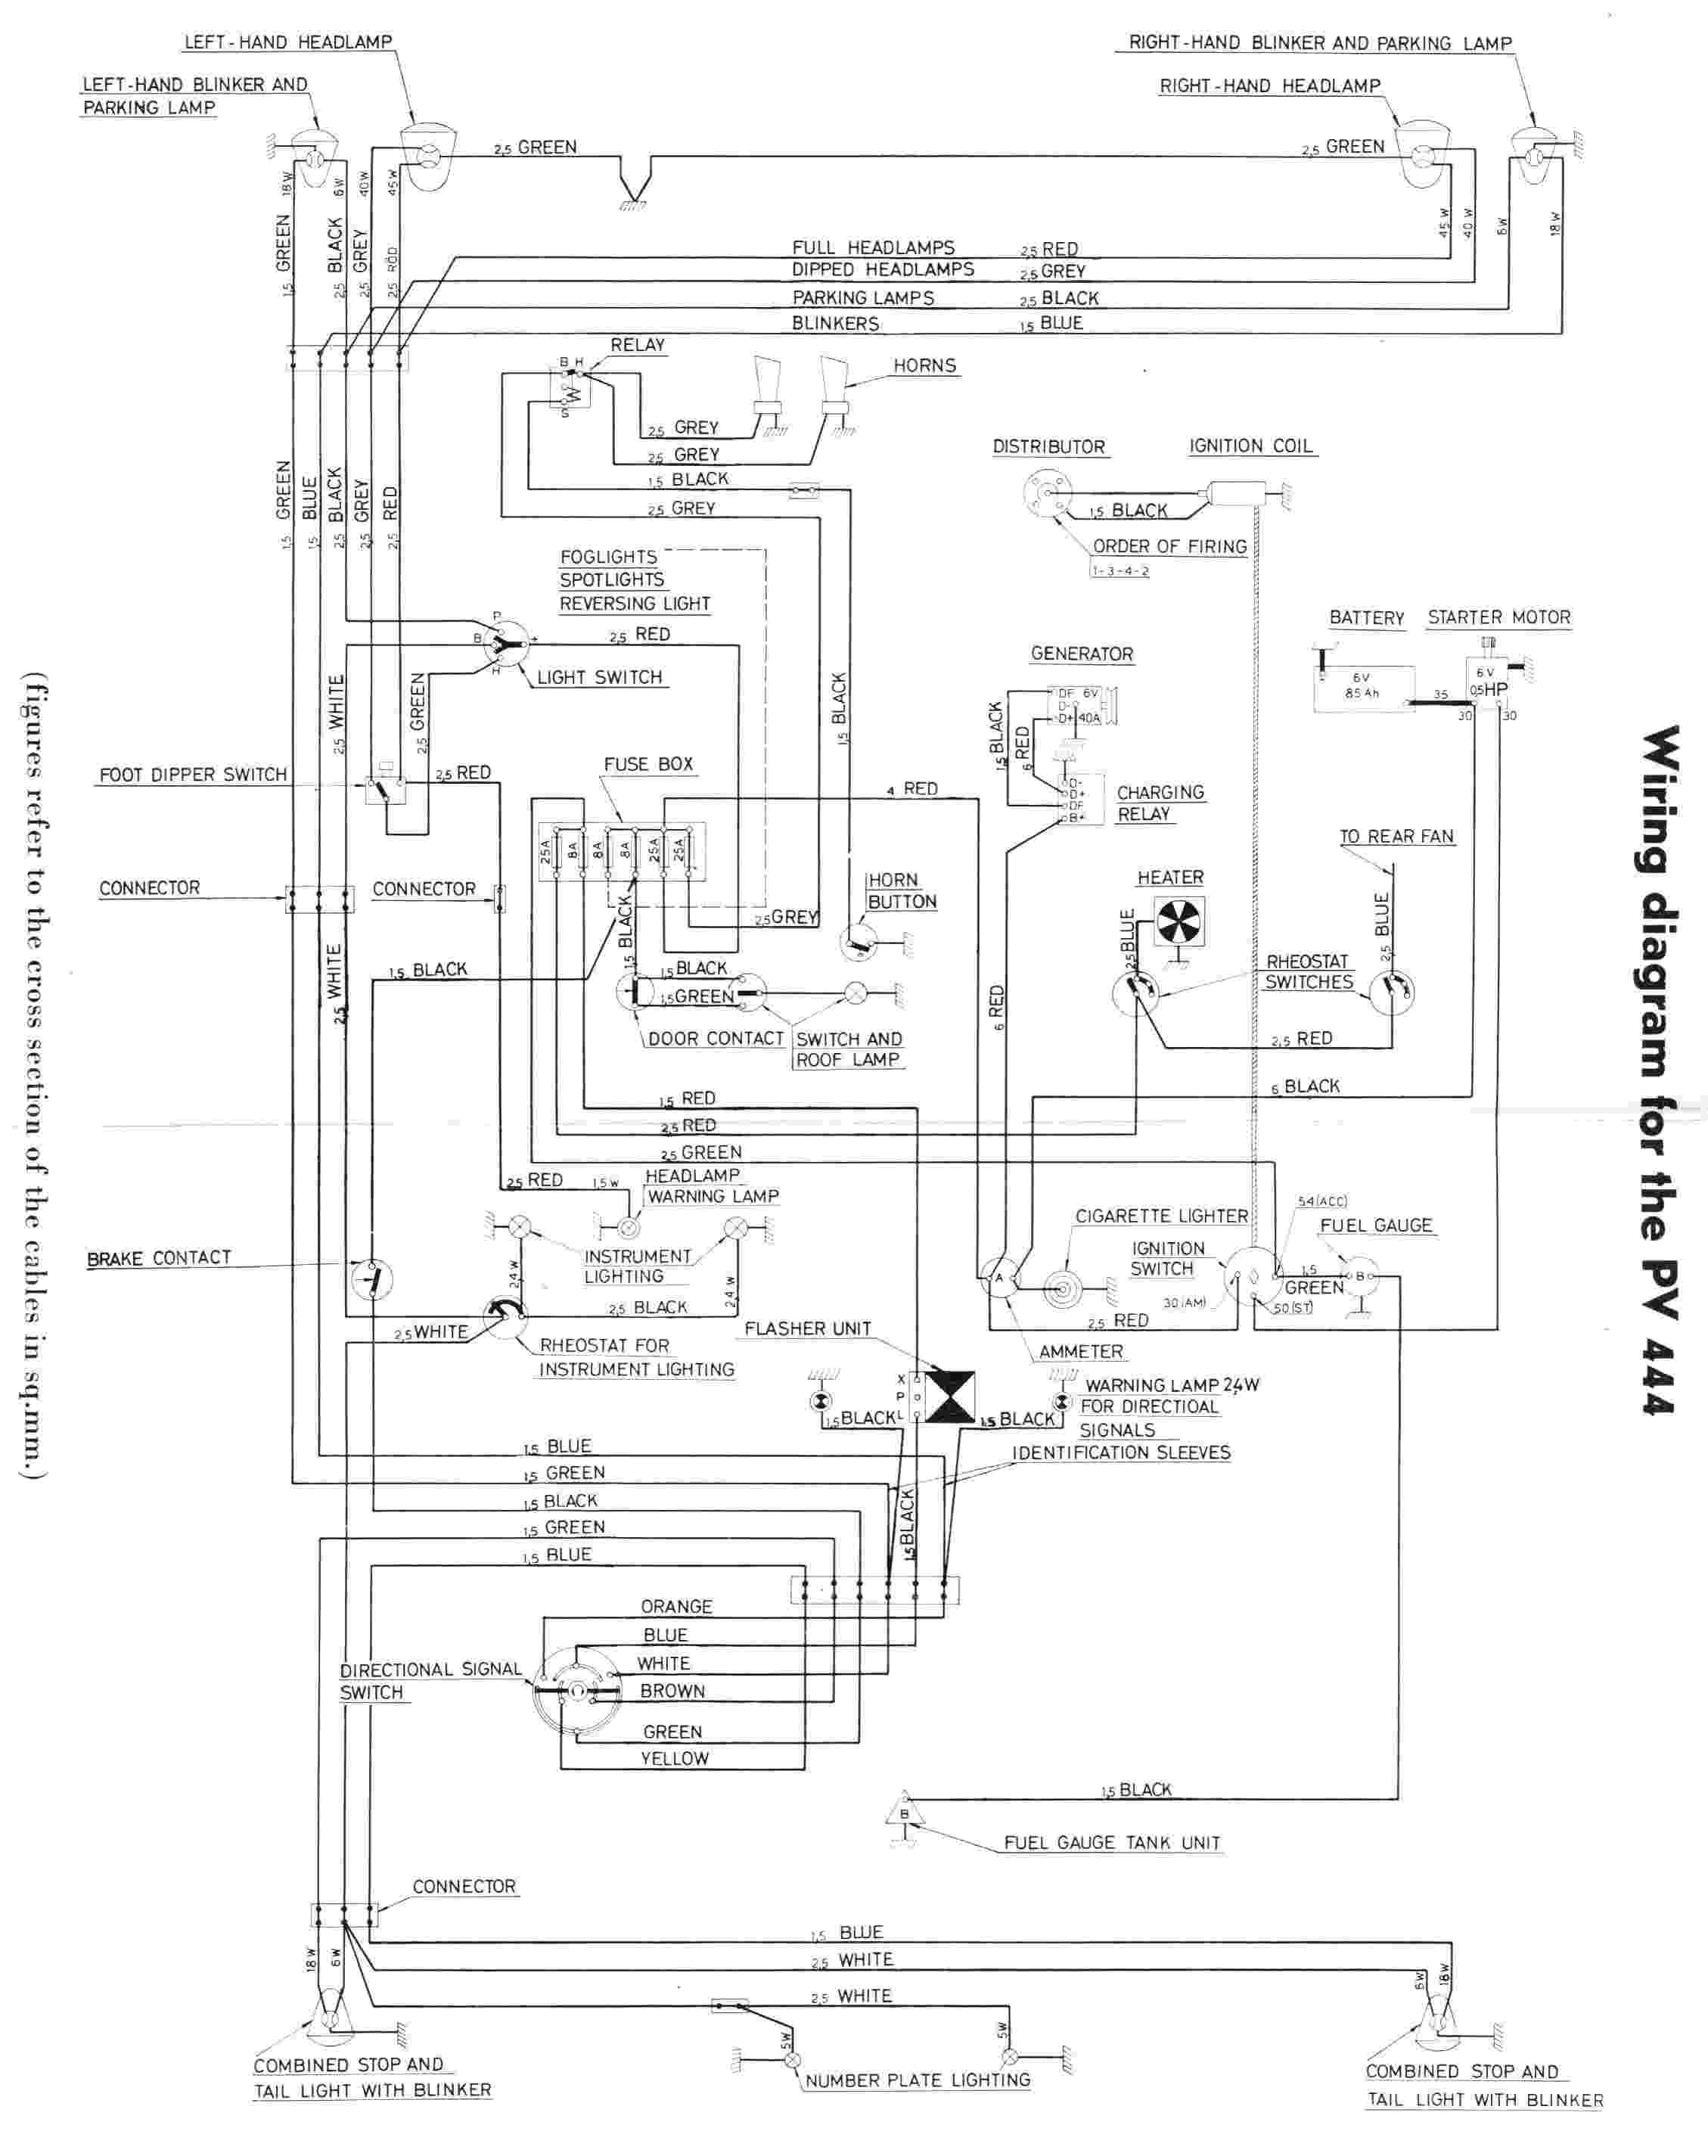 small resolution of 1993 volvo 240 fuse diagram